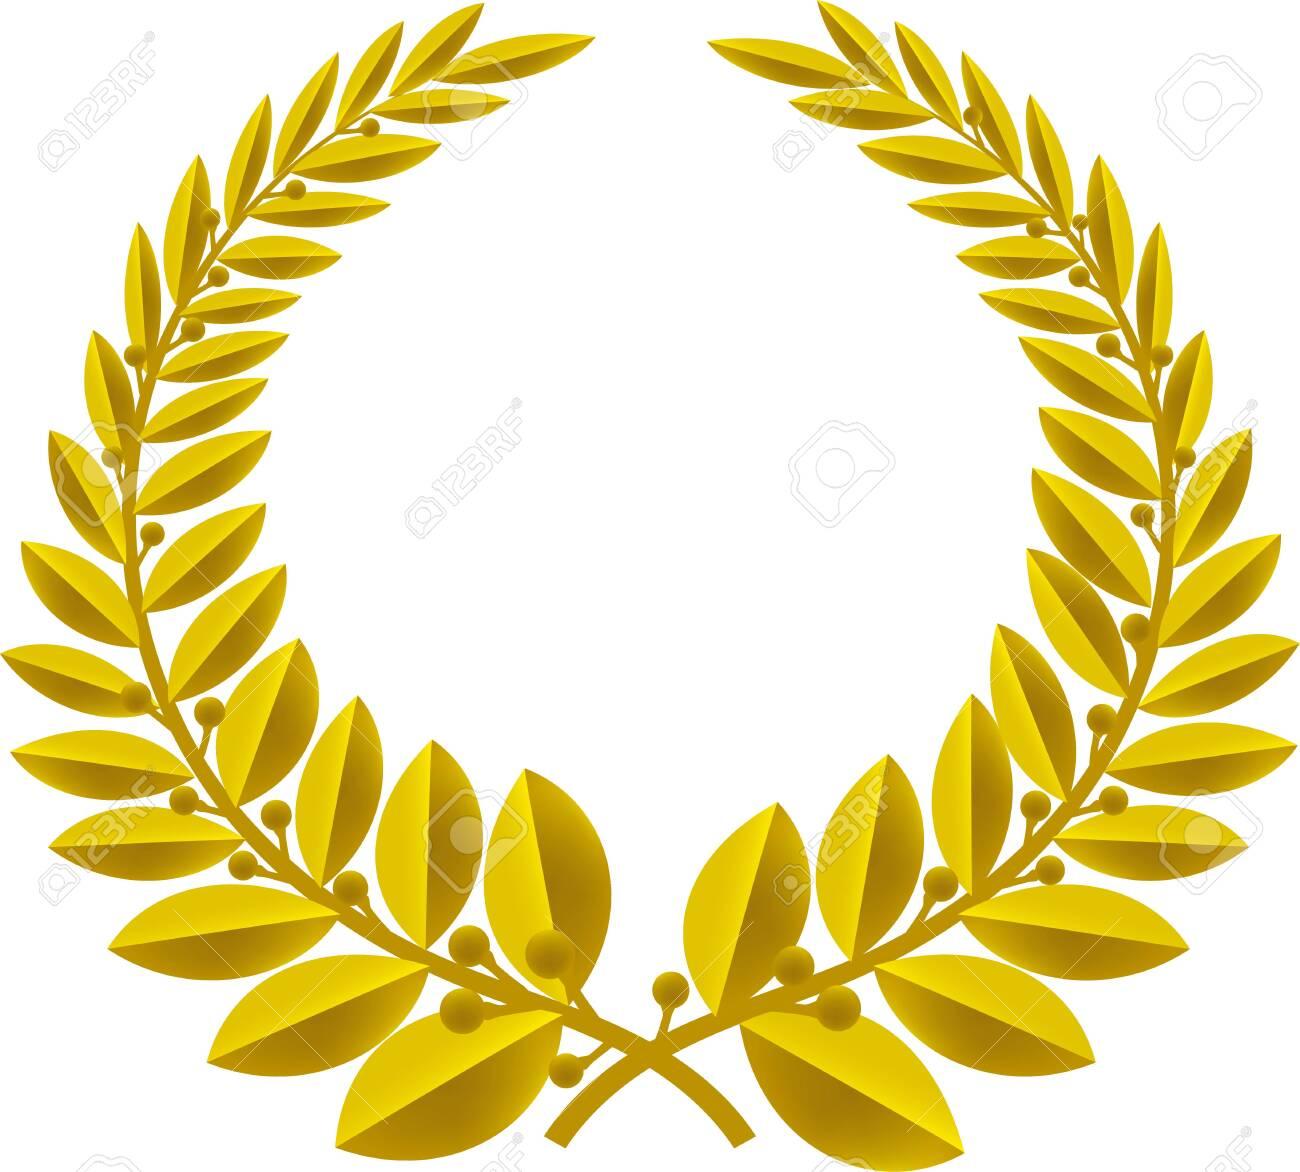 Geometric laurel wreath symbol isolated. Color bronze. - 124065290